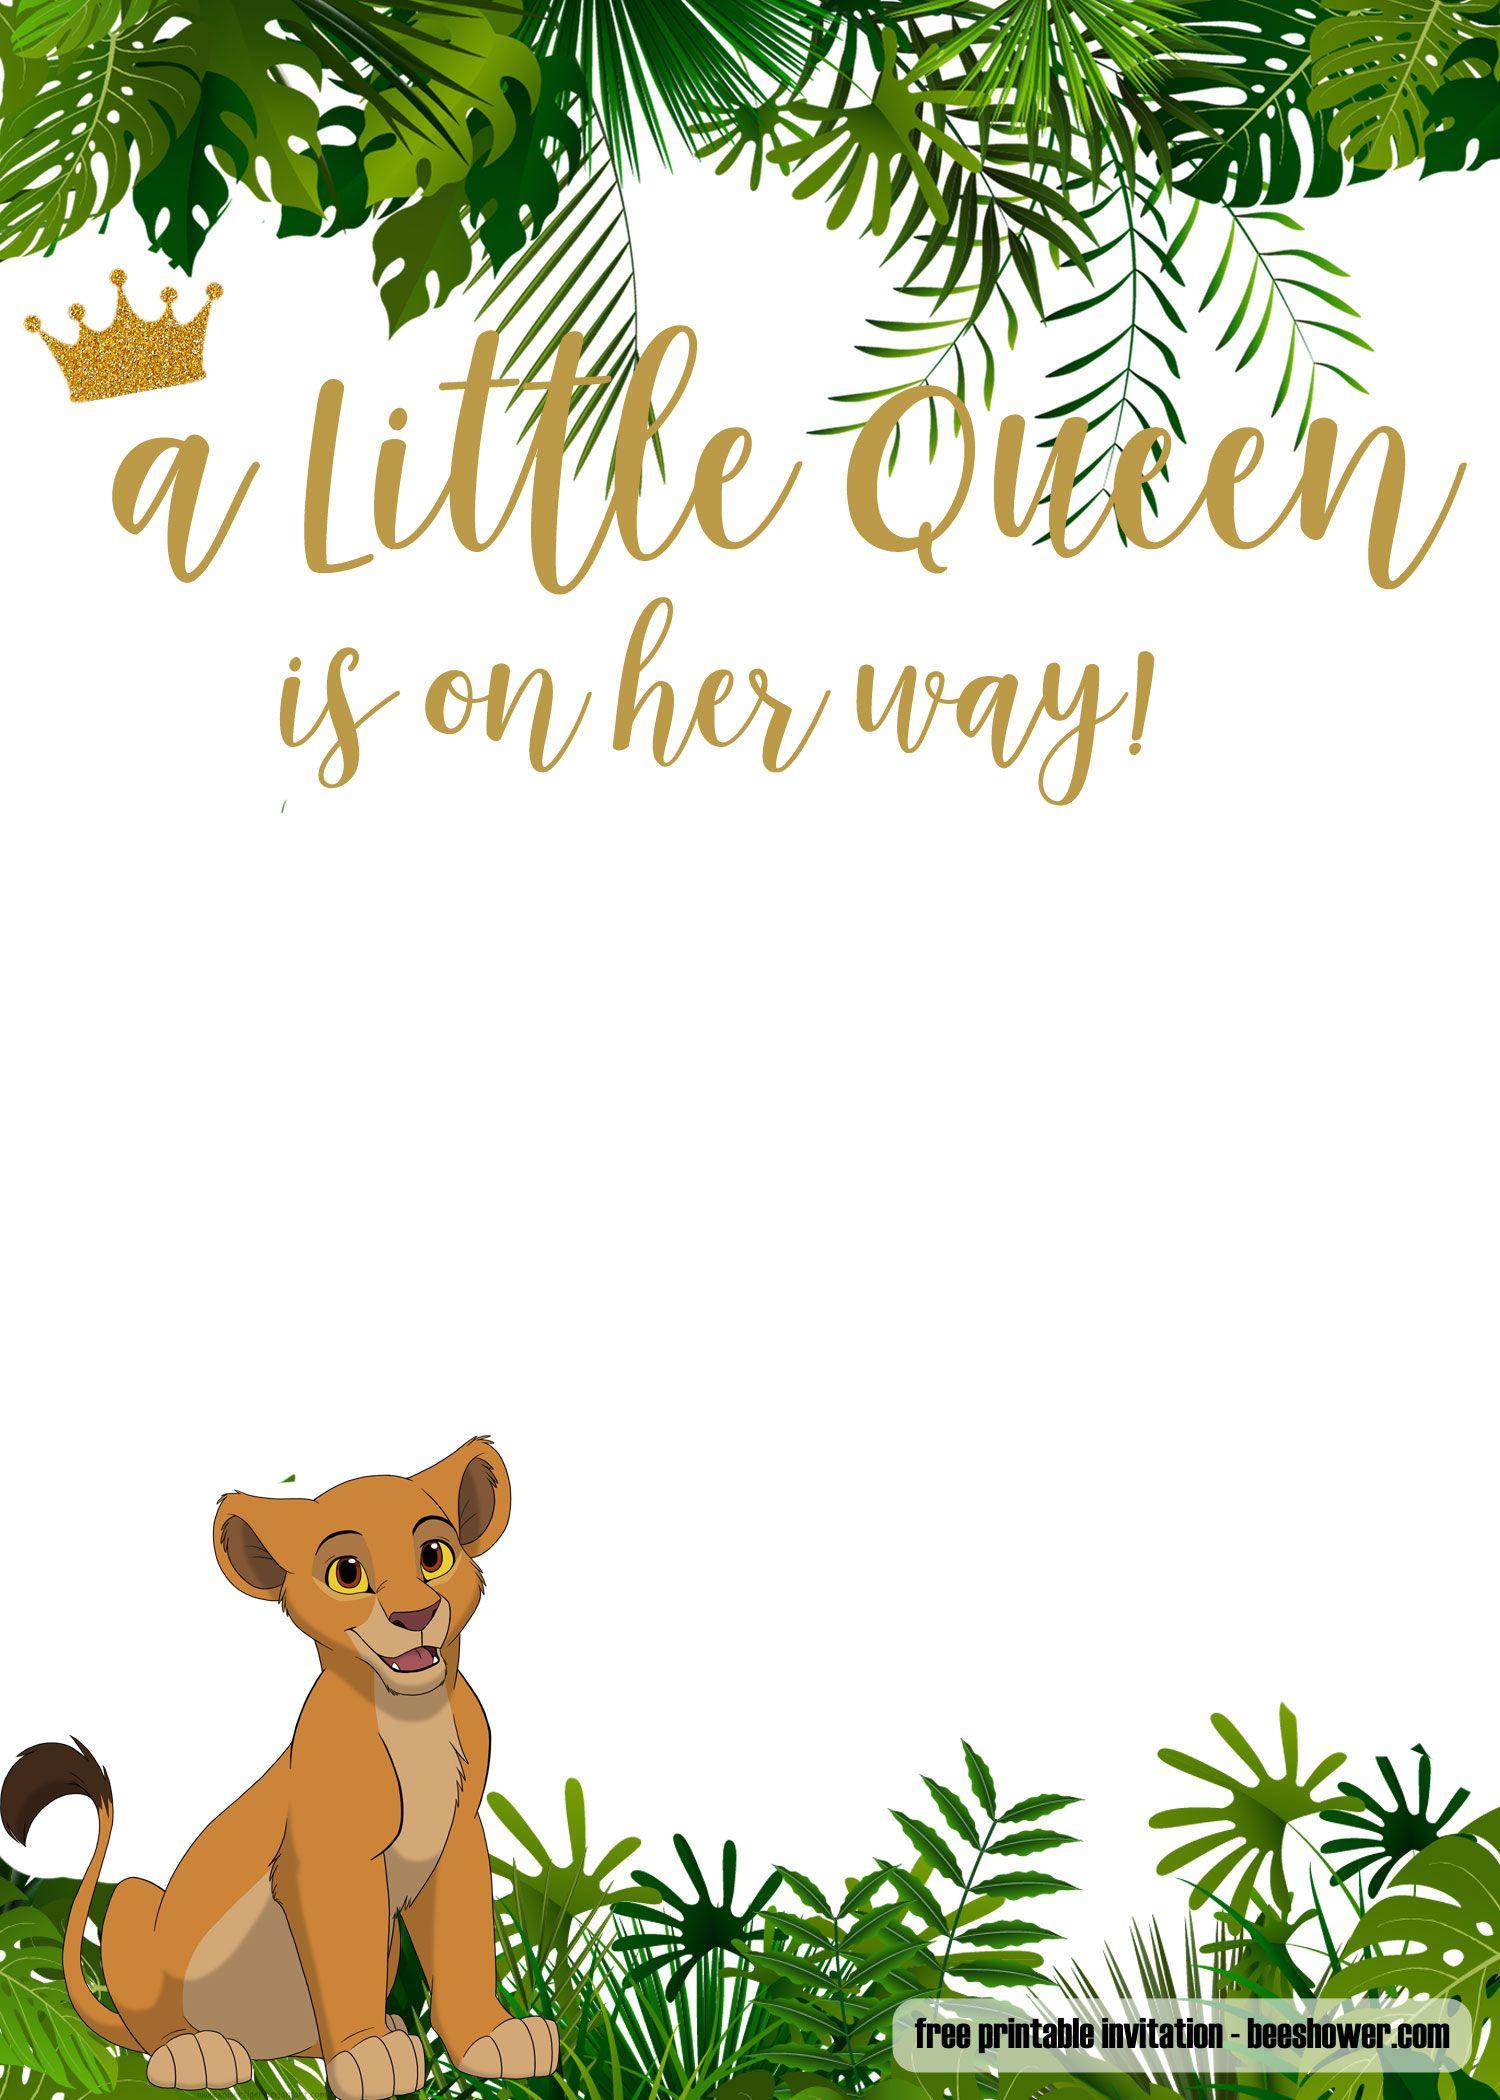 Free Printable Lion King Baby Shower Invitations   Free Printable - Free Printable Lion King Baby Shower Invitations